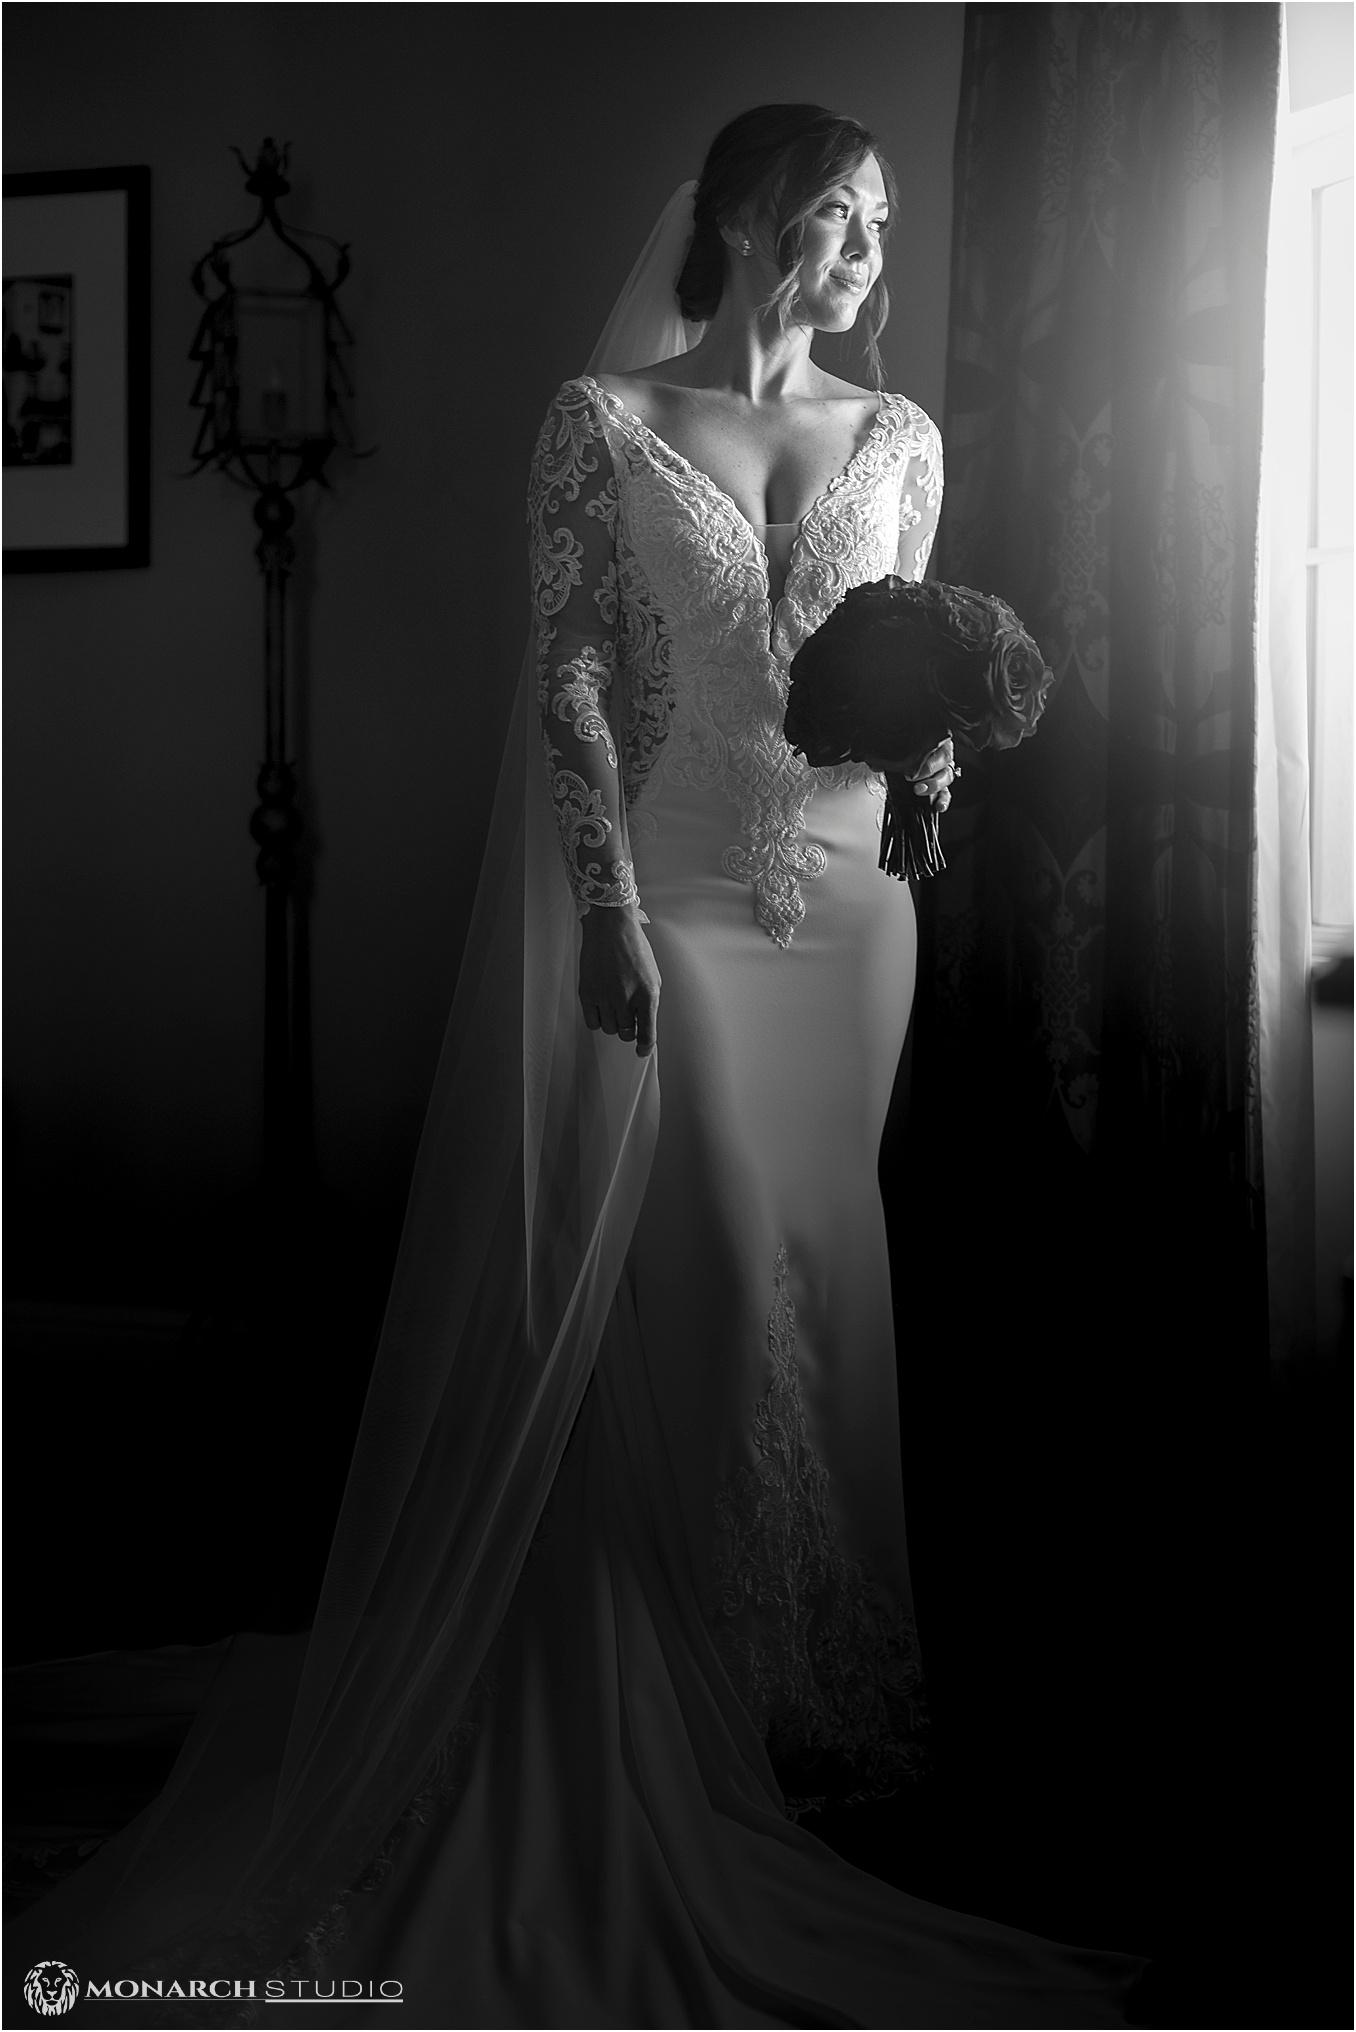 st-augustine-high-end-wedding-photographers-022.jpg